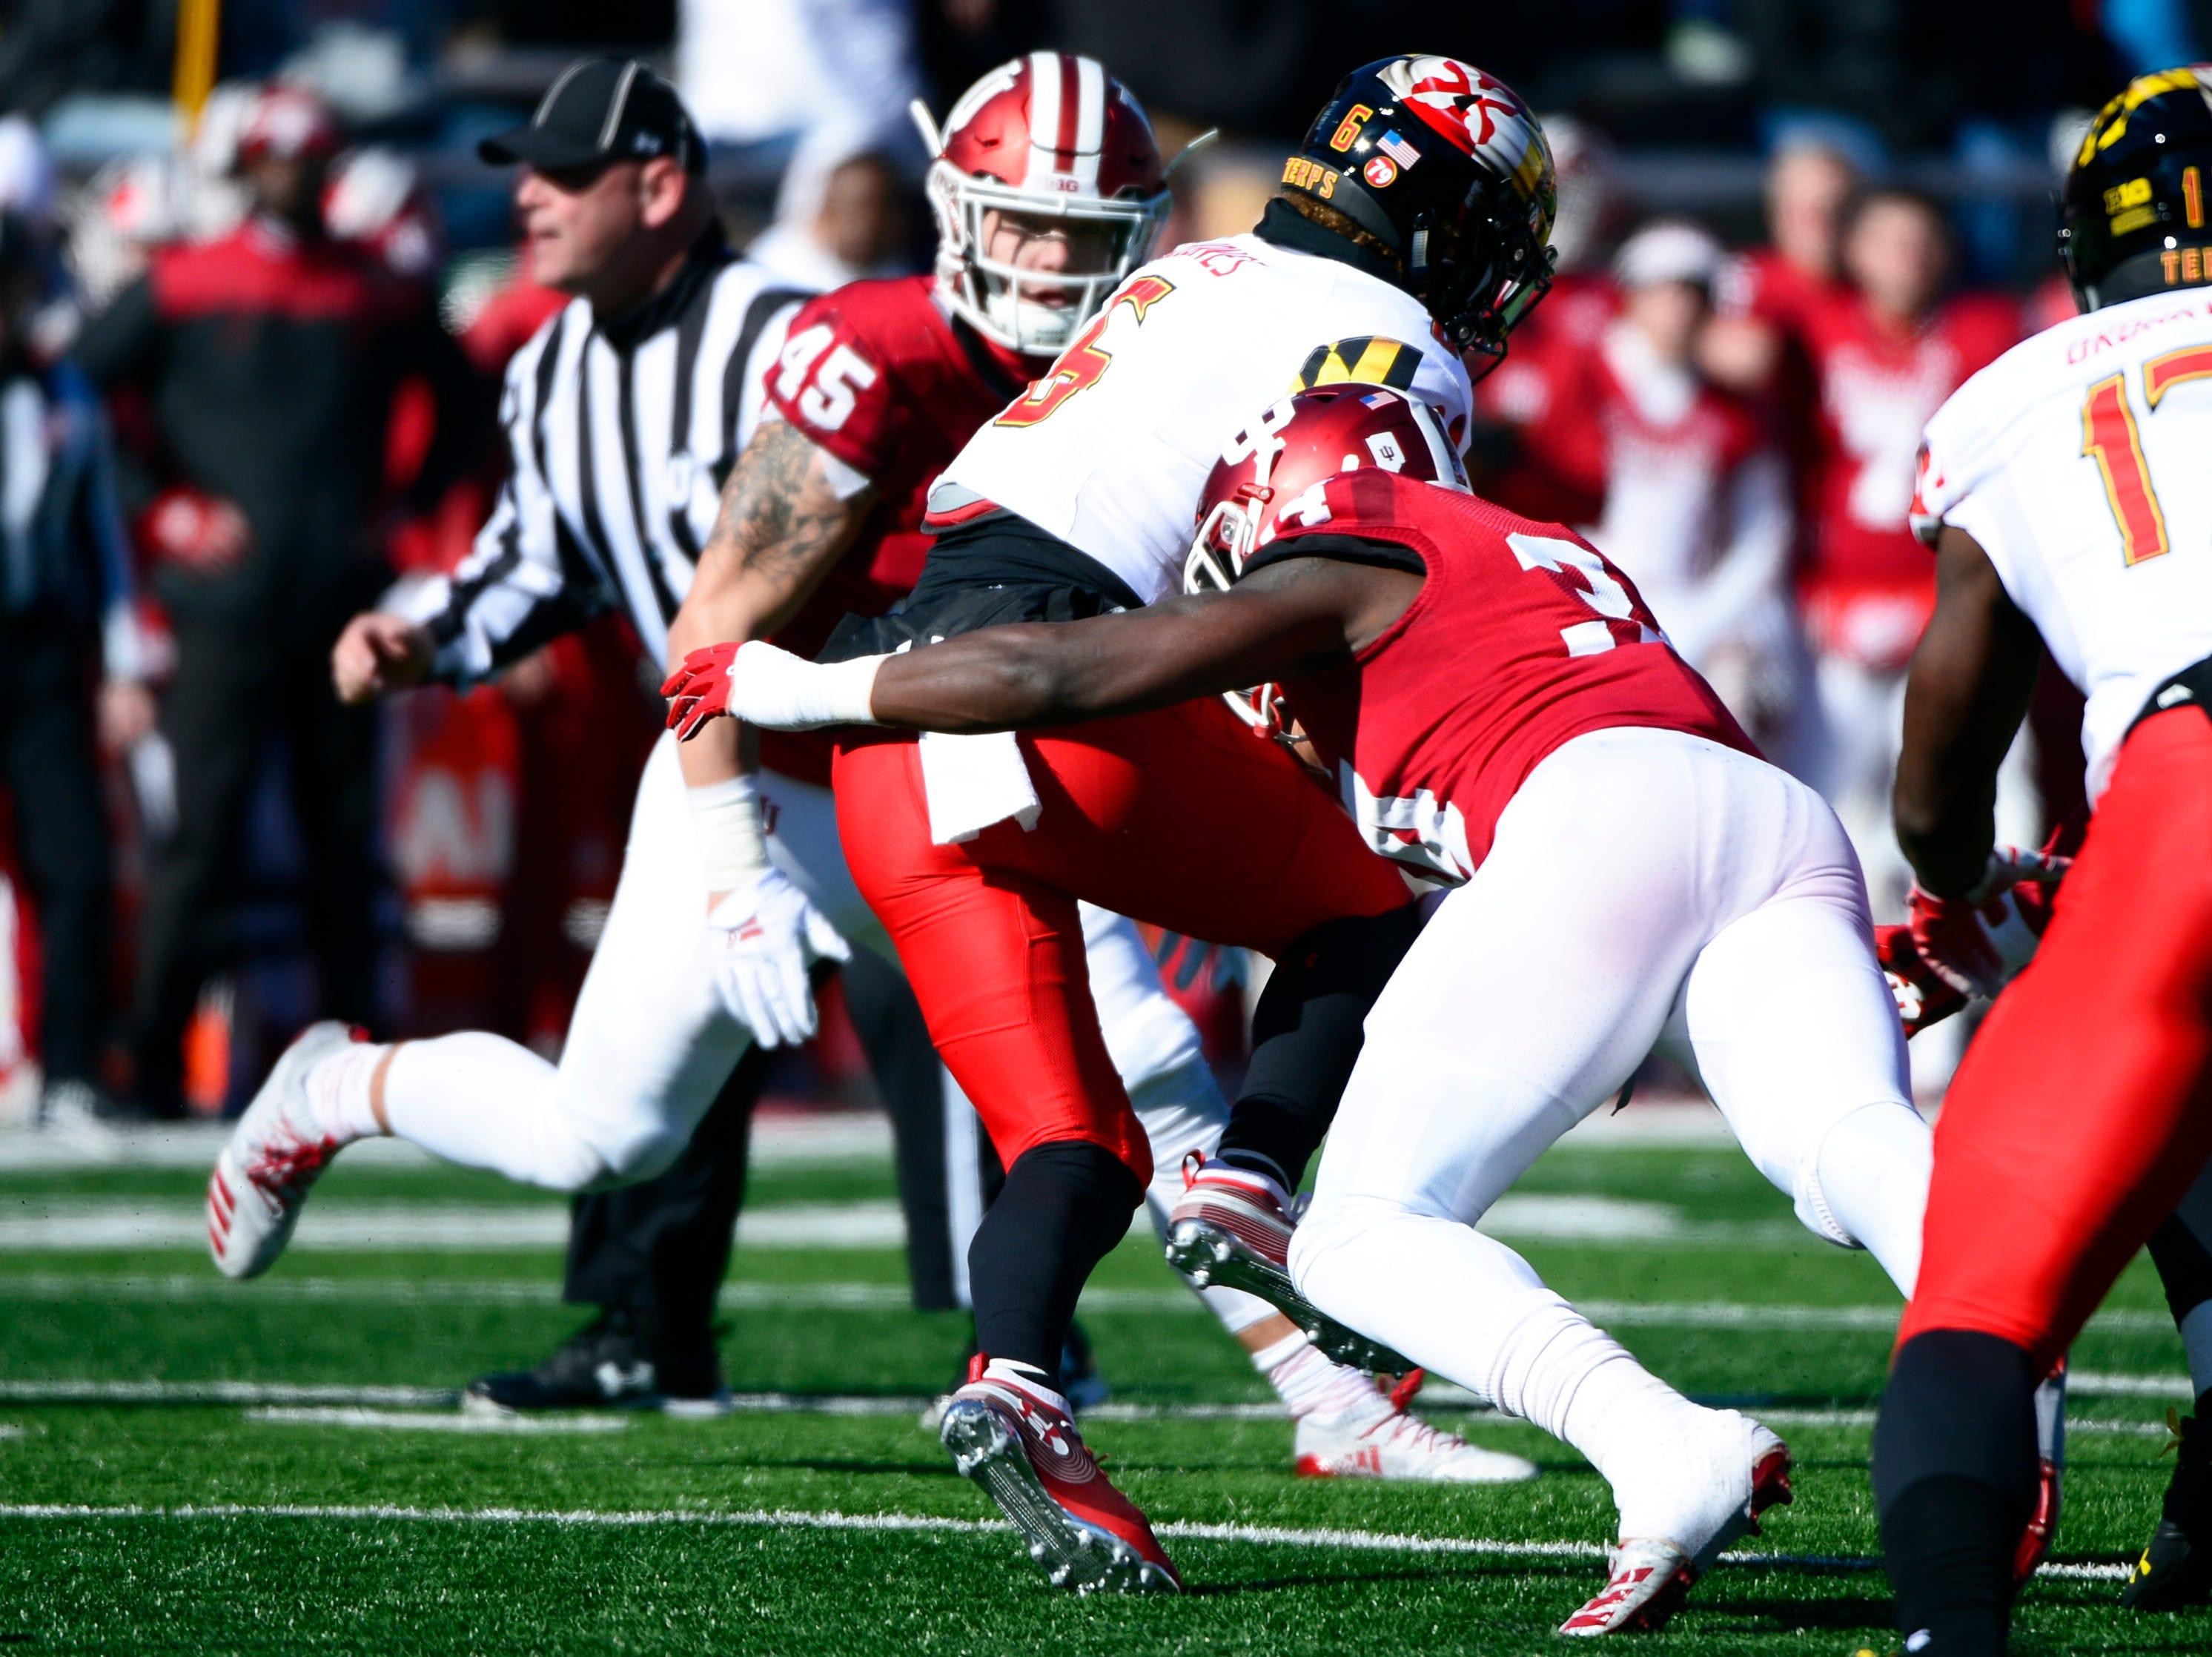 Indiana Hoosiers linebacker Cam Jones (34) tackles Maryland wide receiver Jeshaun Jones (6) during the game against Maryland at Memorial Stadium in Bloomington, Ind., on Satuday, Nov. 10, 2018.